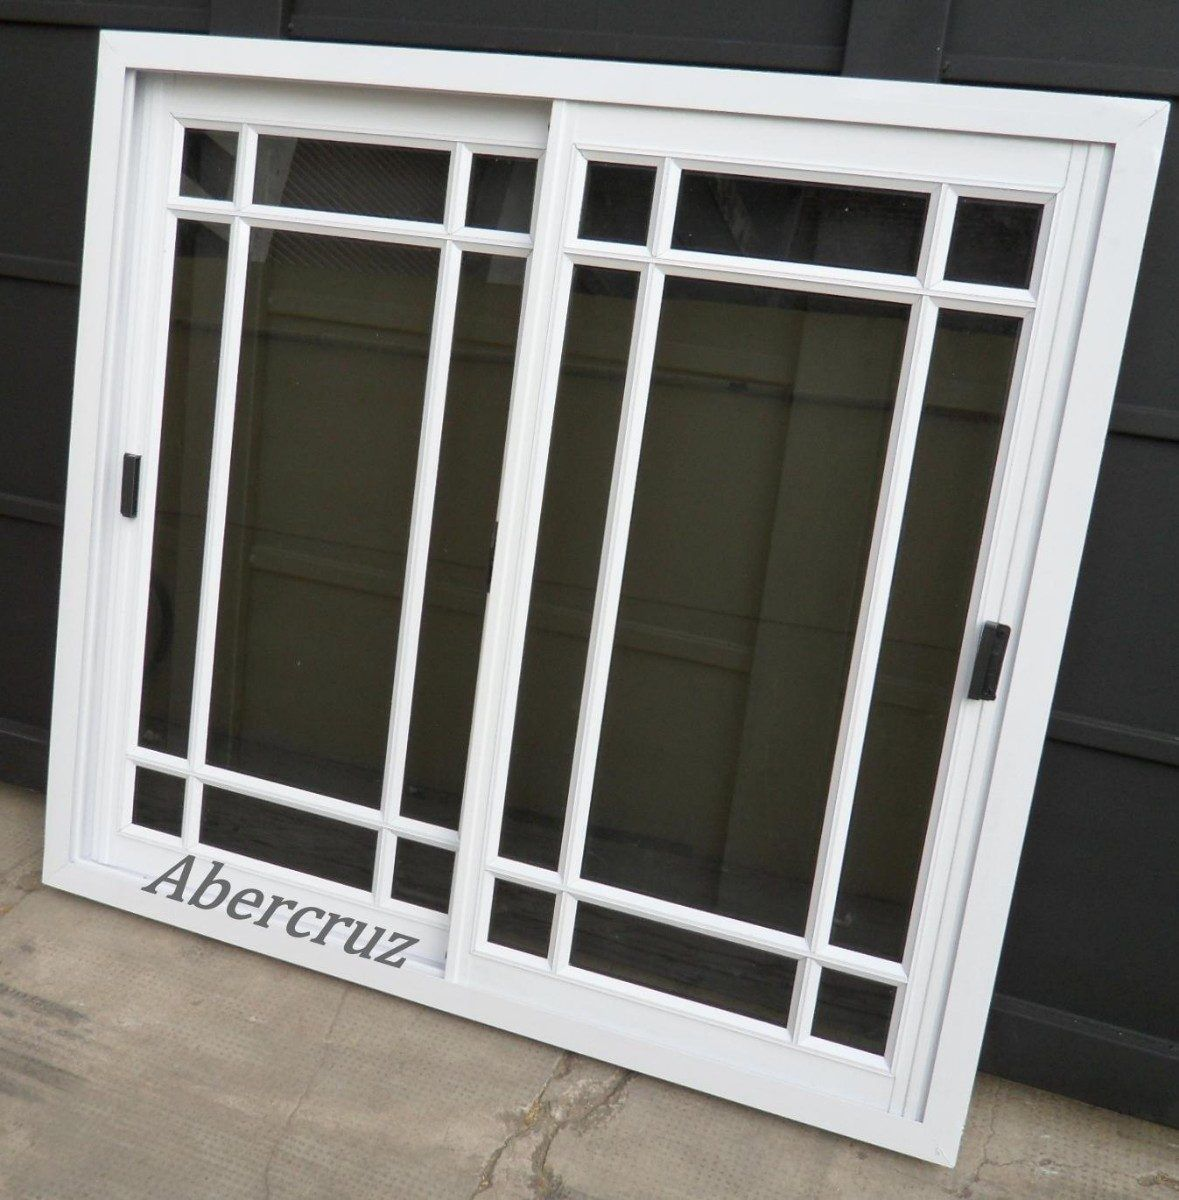 Imagen de http mla s1 for Ver precios de ventanas de aluminio